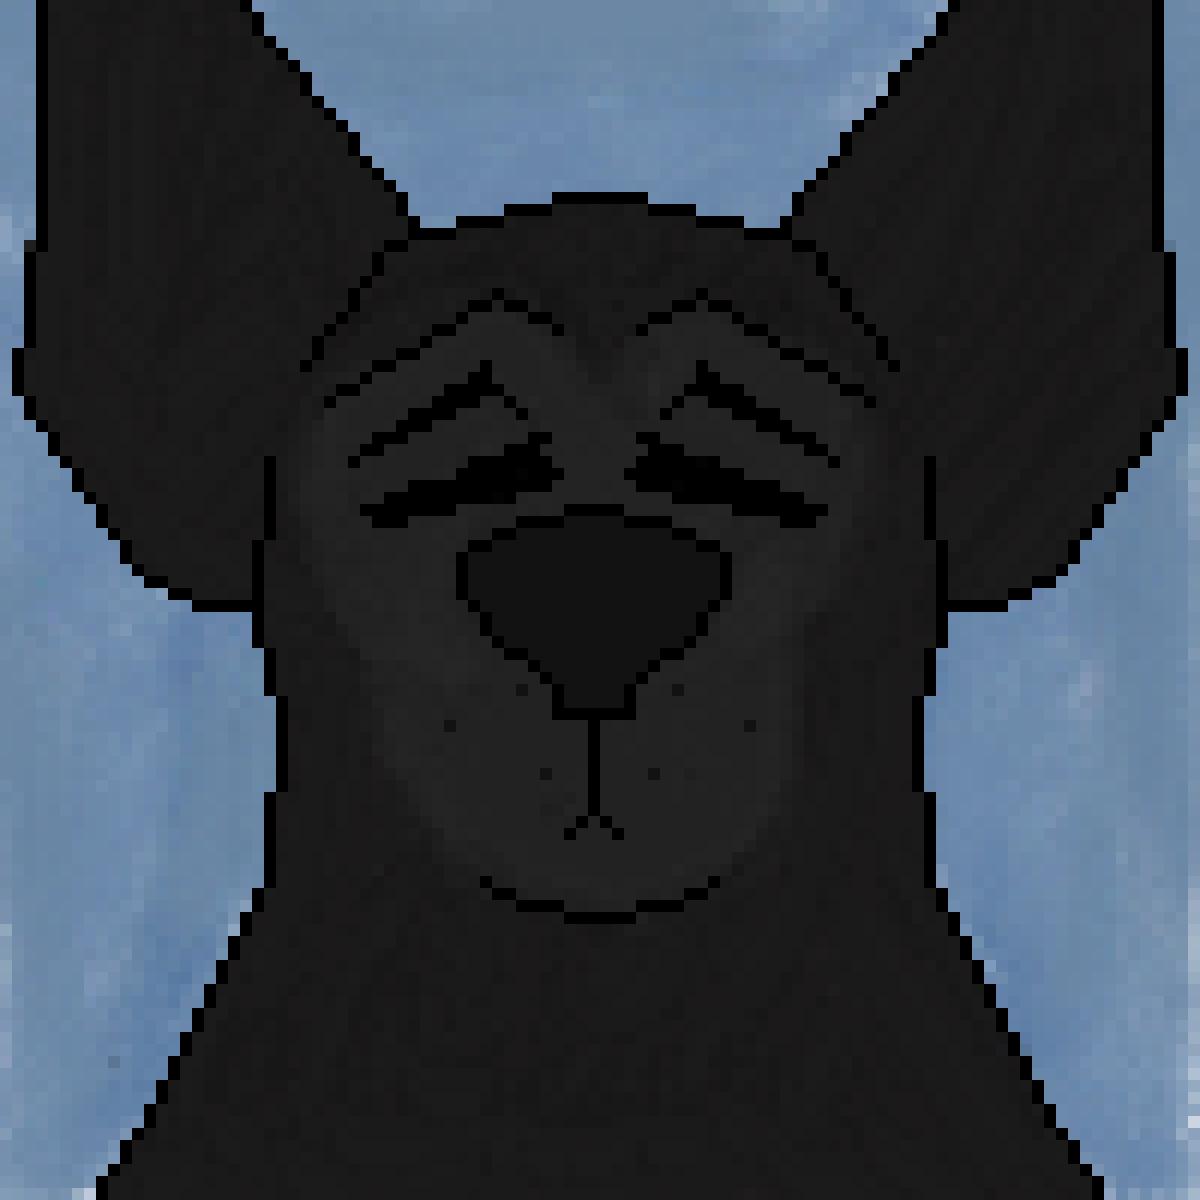 Dog by ThunderThighs